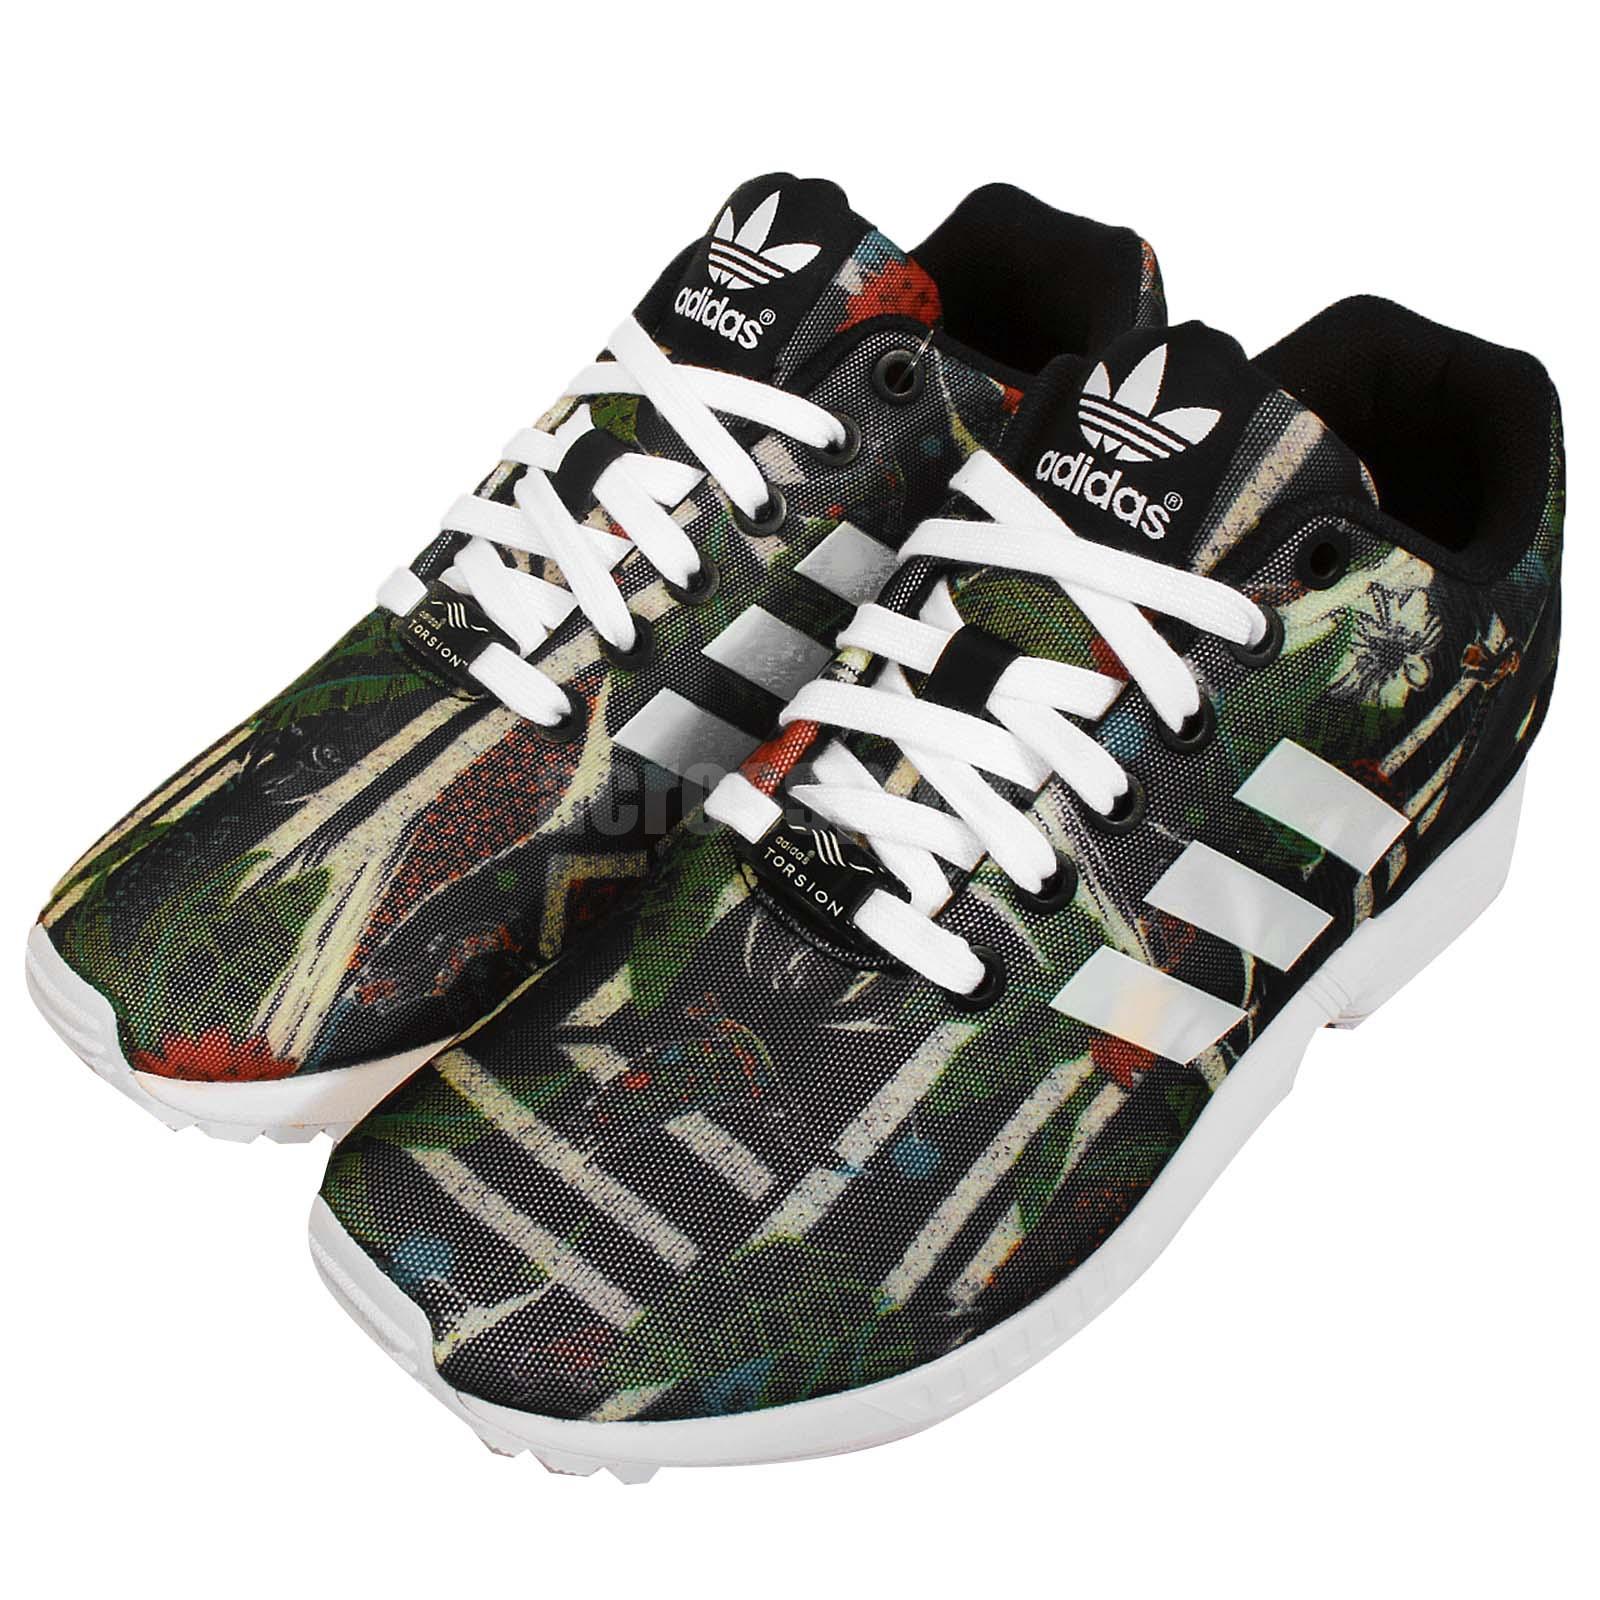 ADIDAS ZX FLUX ADV Verve W tg 38 2/3 Scarpe Sneaker Verde Donna Nuovo Sport s75984